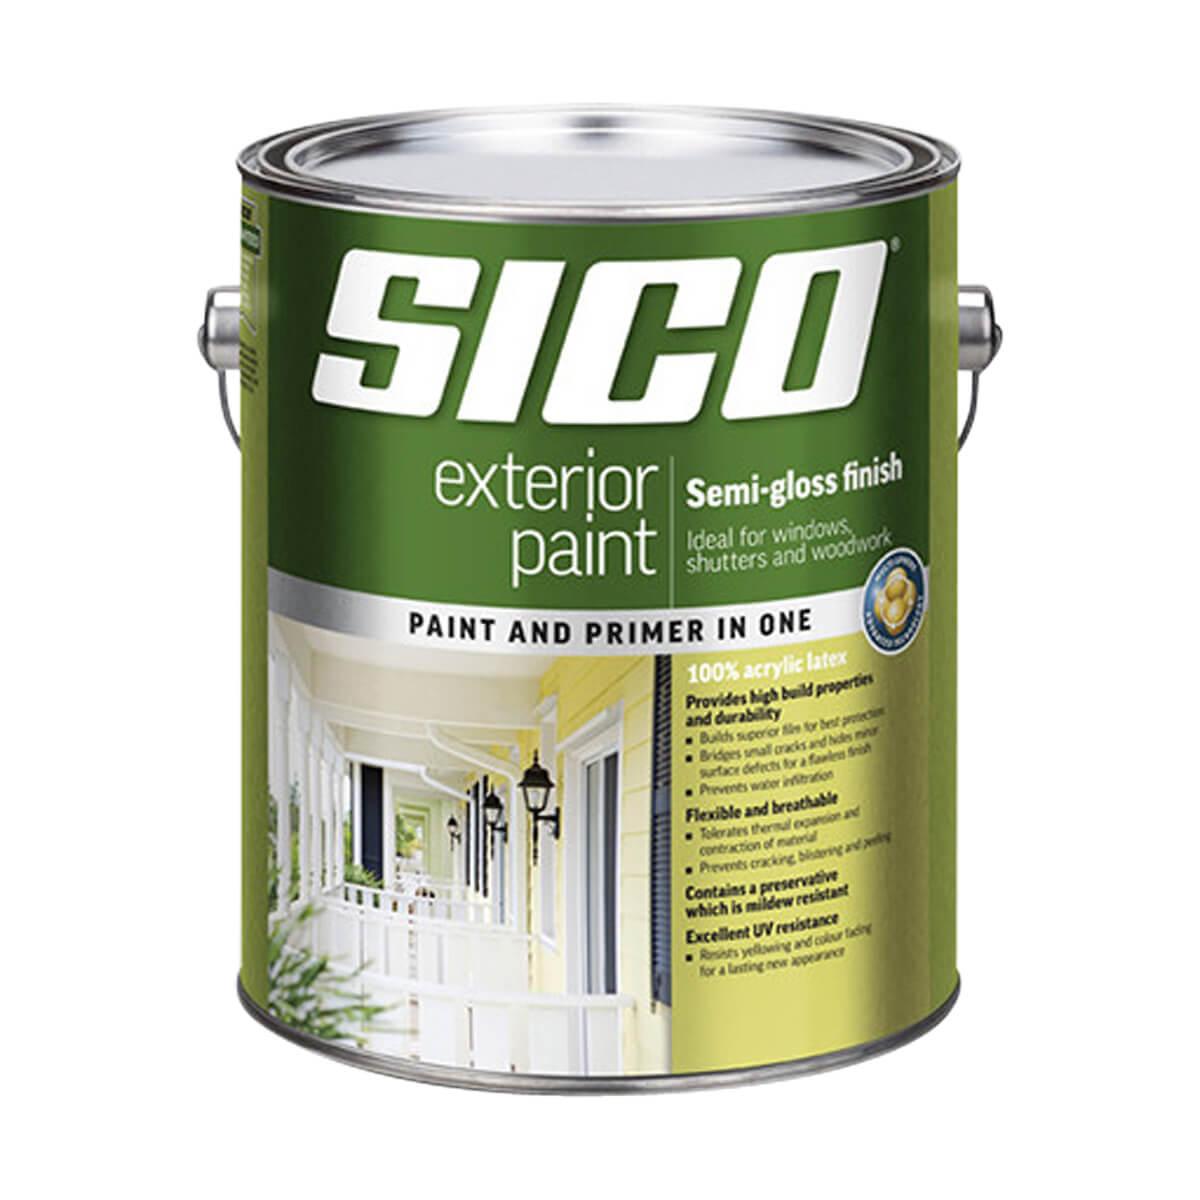 SICO Exterior Paint - Acylic - Semi-gloss Series 817 - Yellow Base - 3.78L